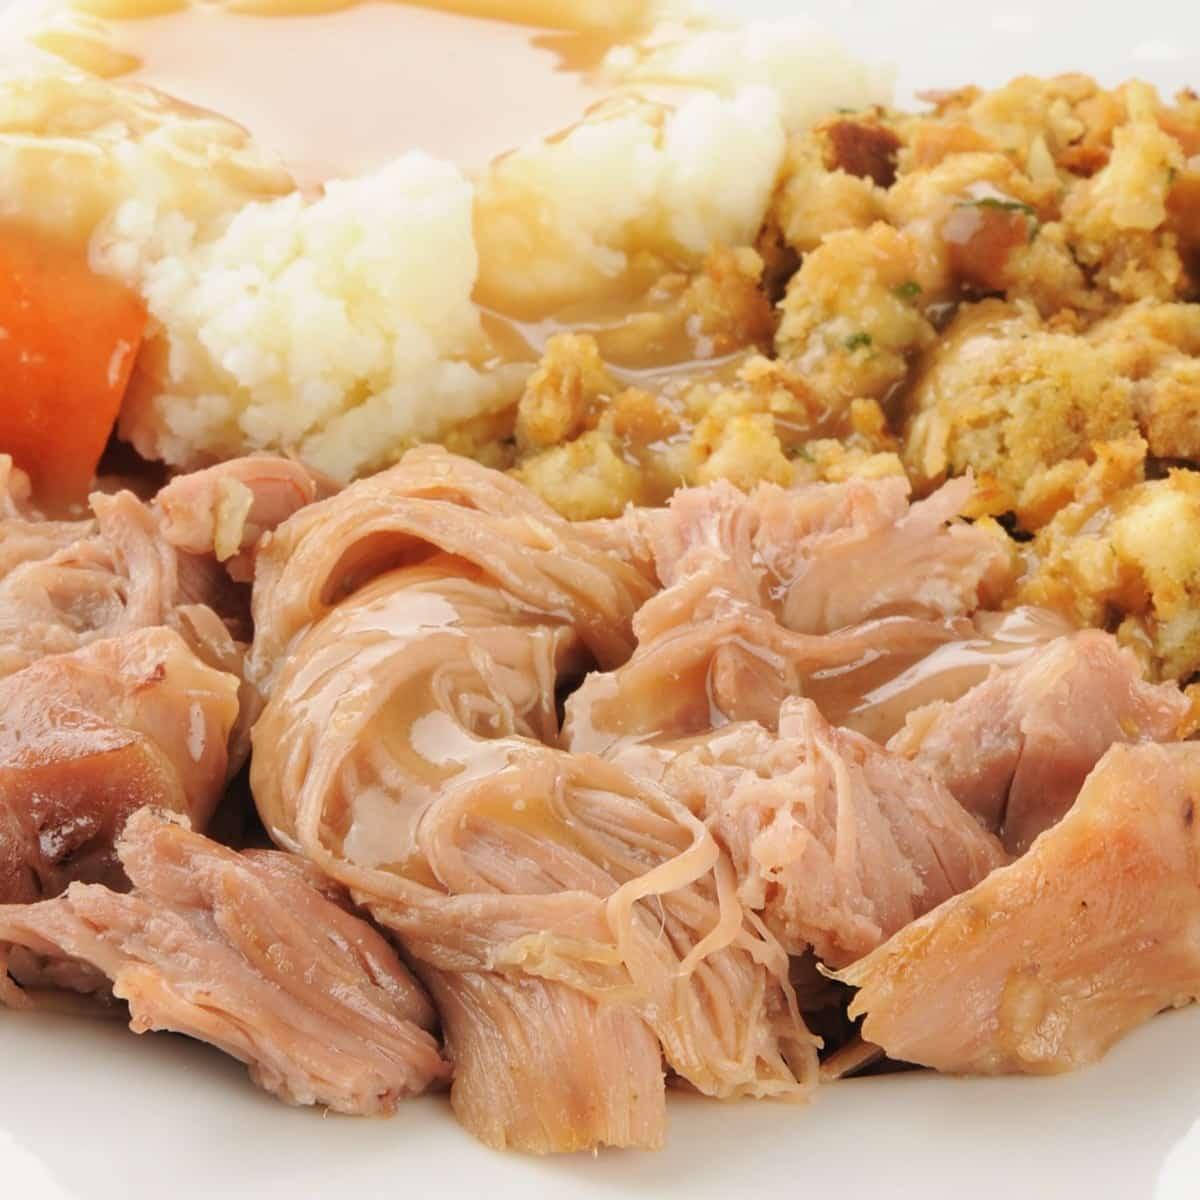 5-Ingredient Crock Pot Turkey